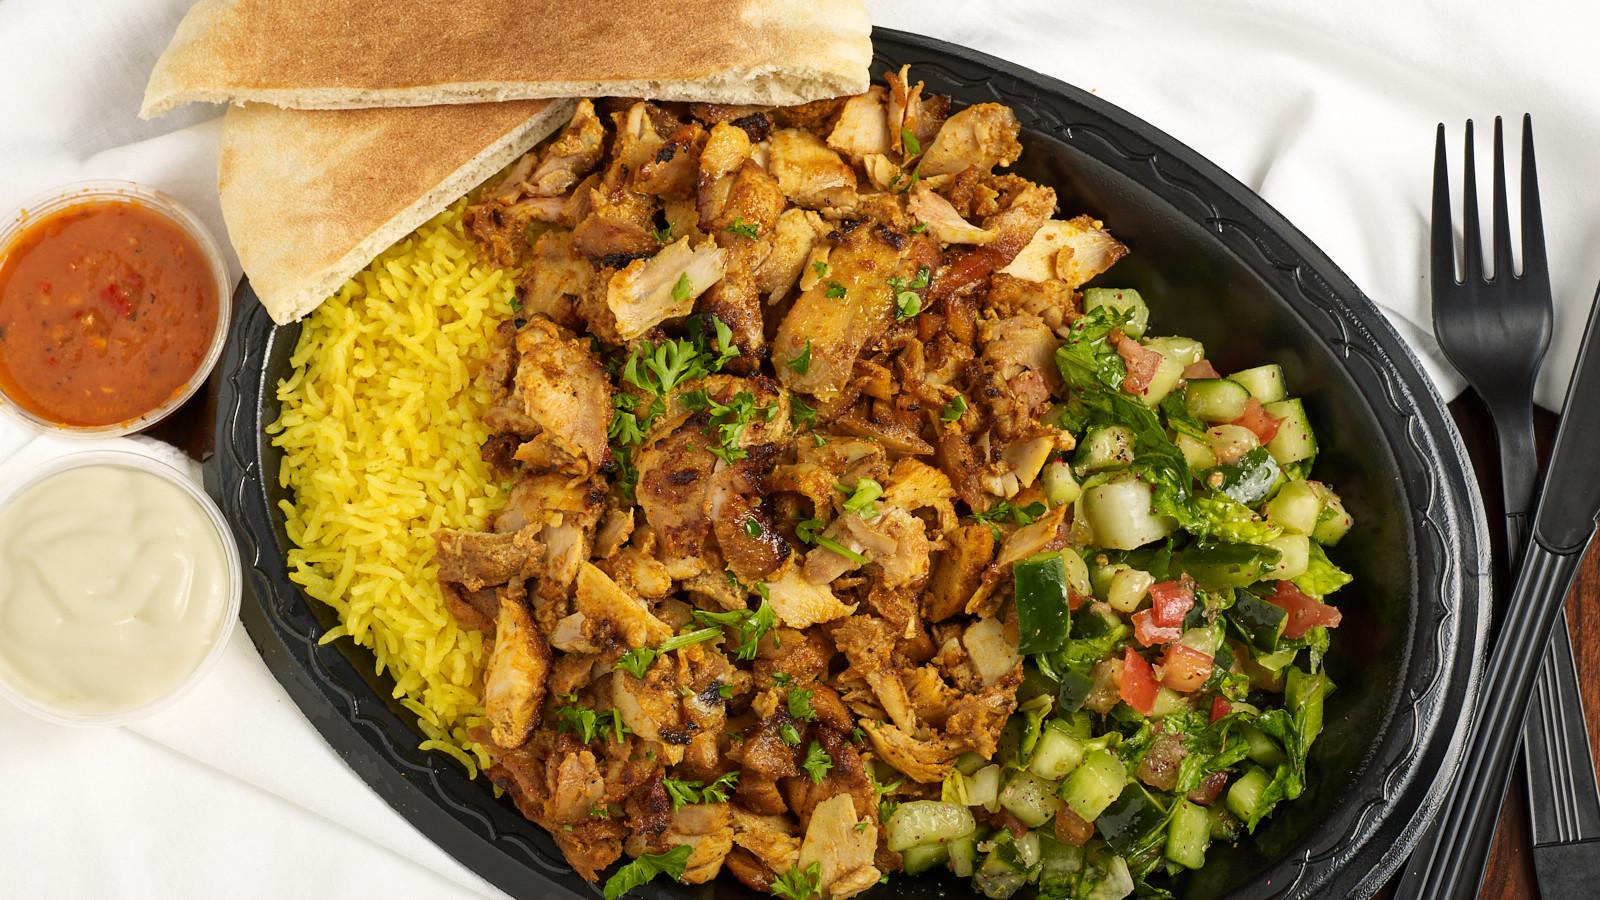 Chicken Shawarma Plate.jpg